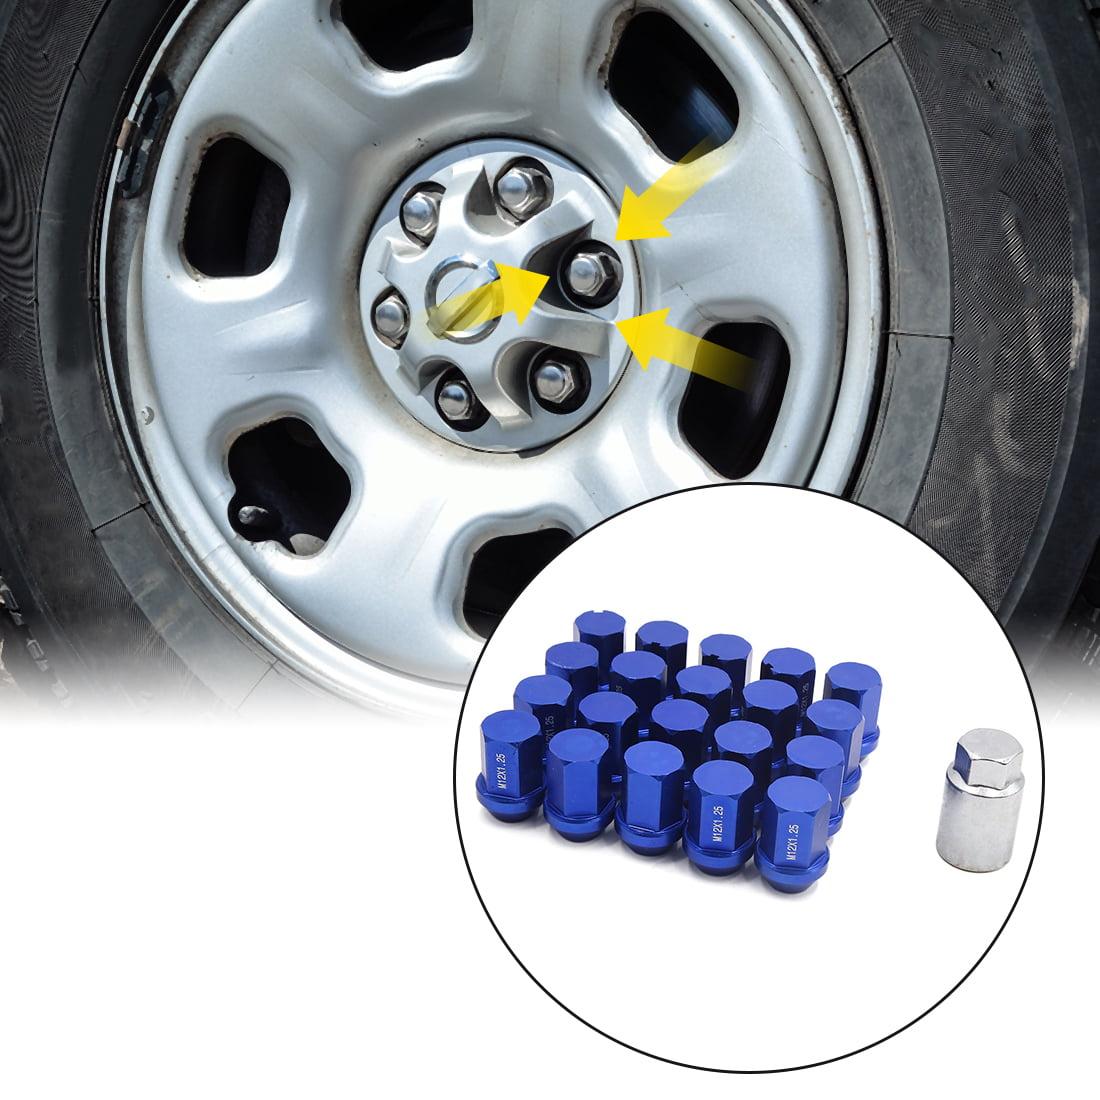 1 Nut Screw Nut Universal A Set of Car Tire Wheel Anti-theft 4